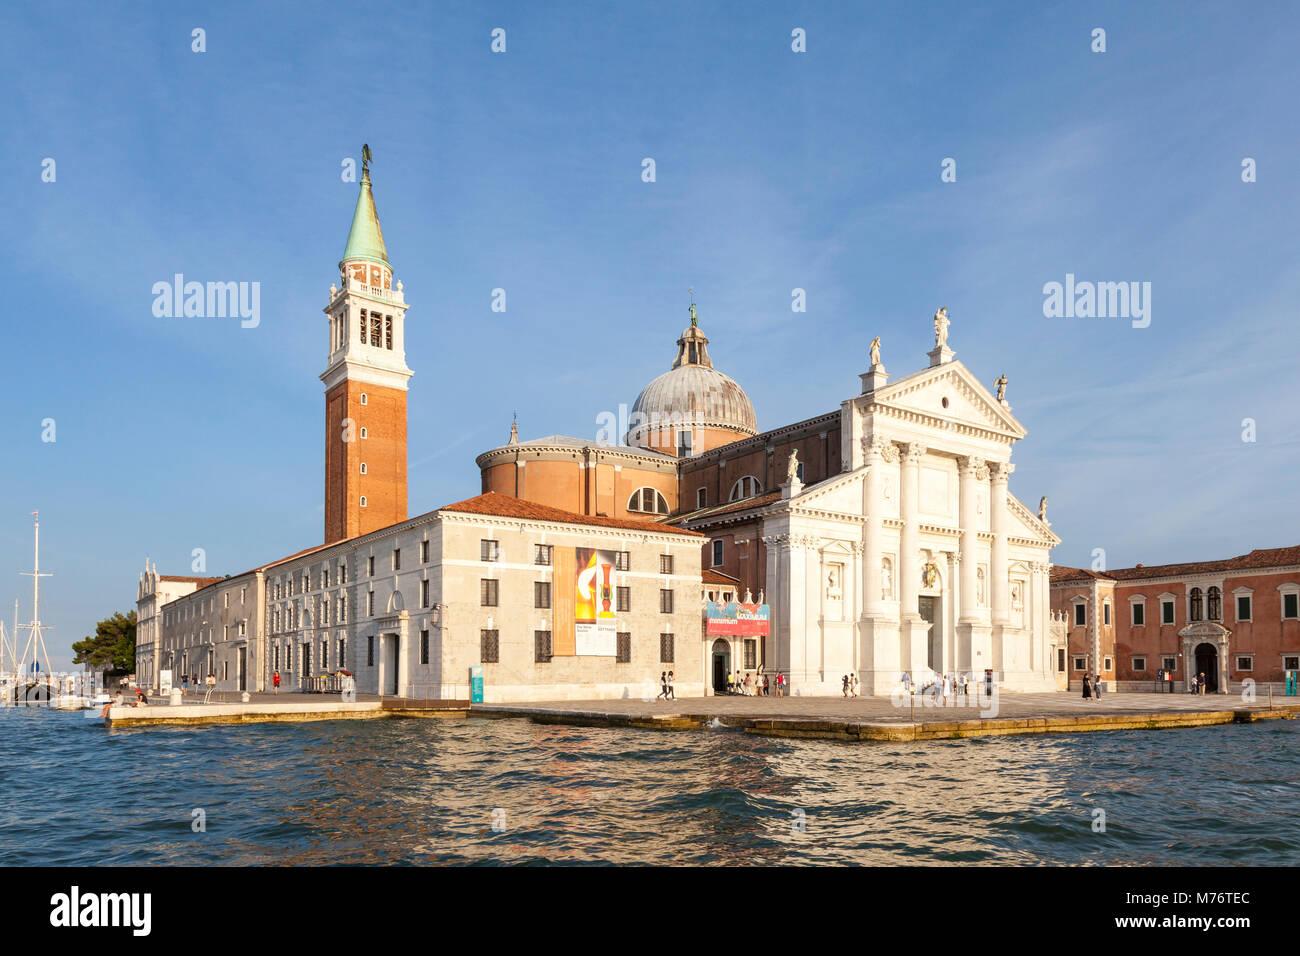 Isola di San Giorgio Maggiore al atardecer, Venecia, Véneto, Italia con el San Maggiore iglesia diseñada por Palladio y monasterio benedictino de la G Foto de stock